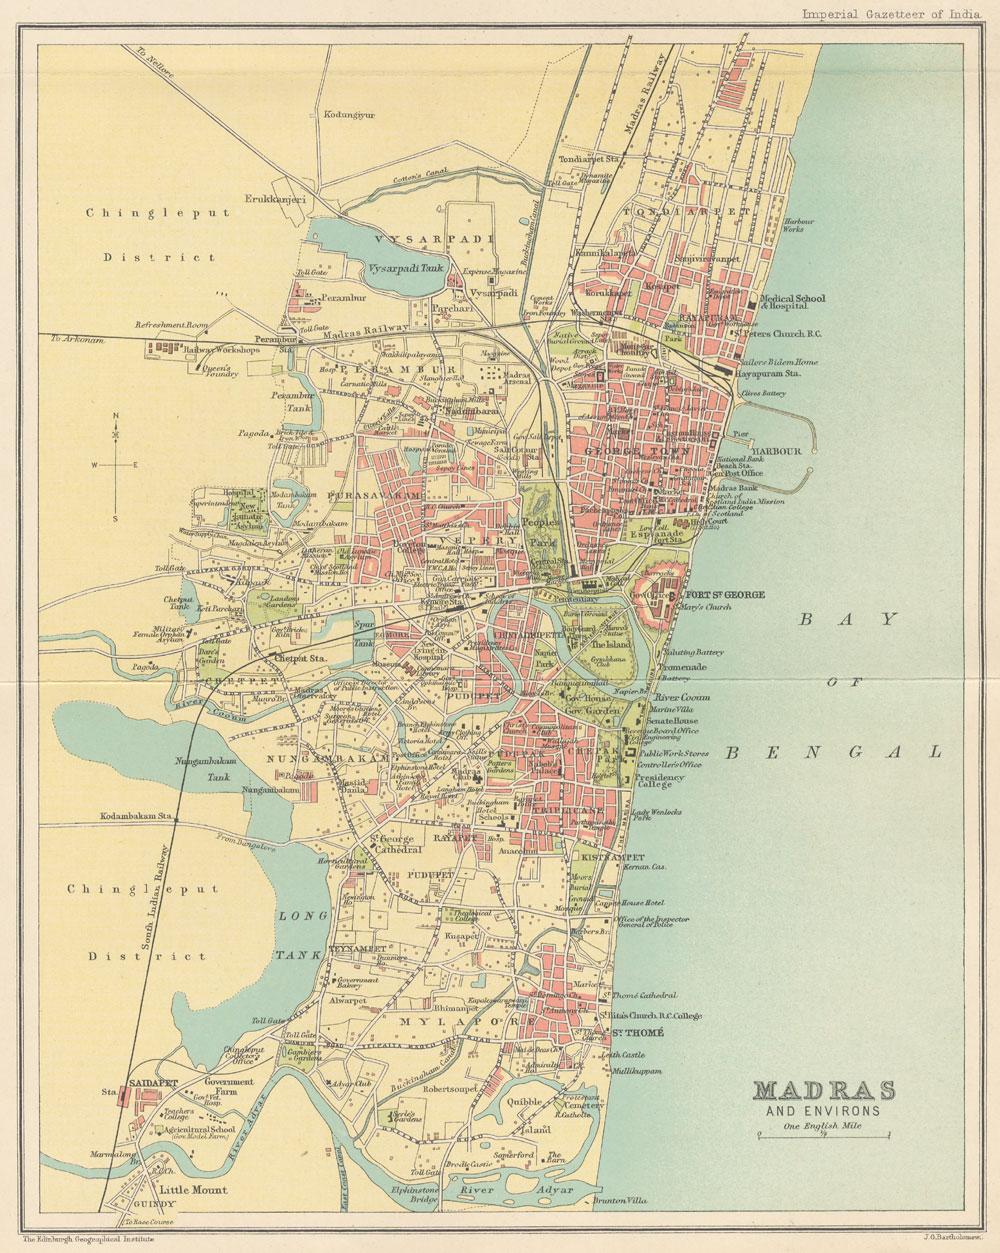 Speculation on Property in Chennai: Location Adyar